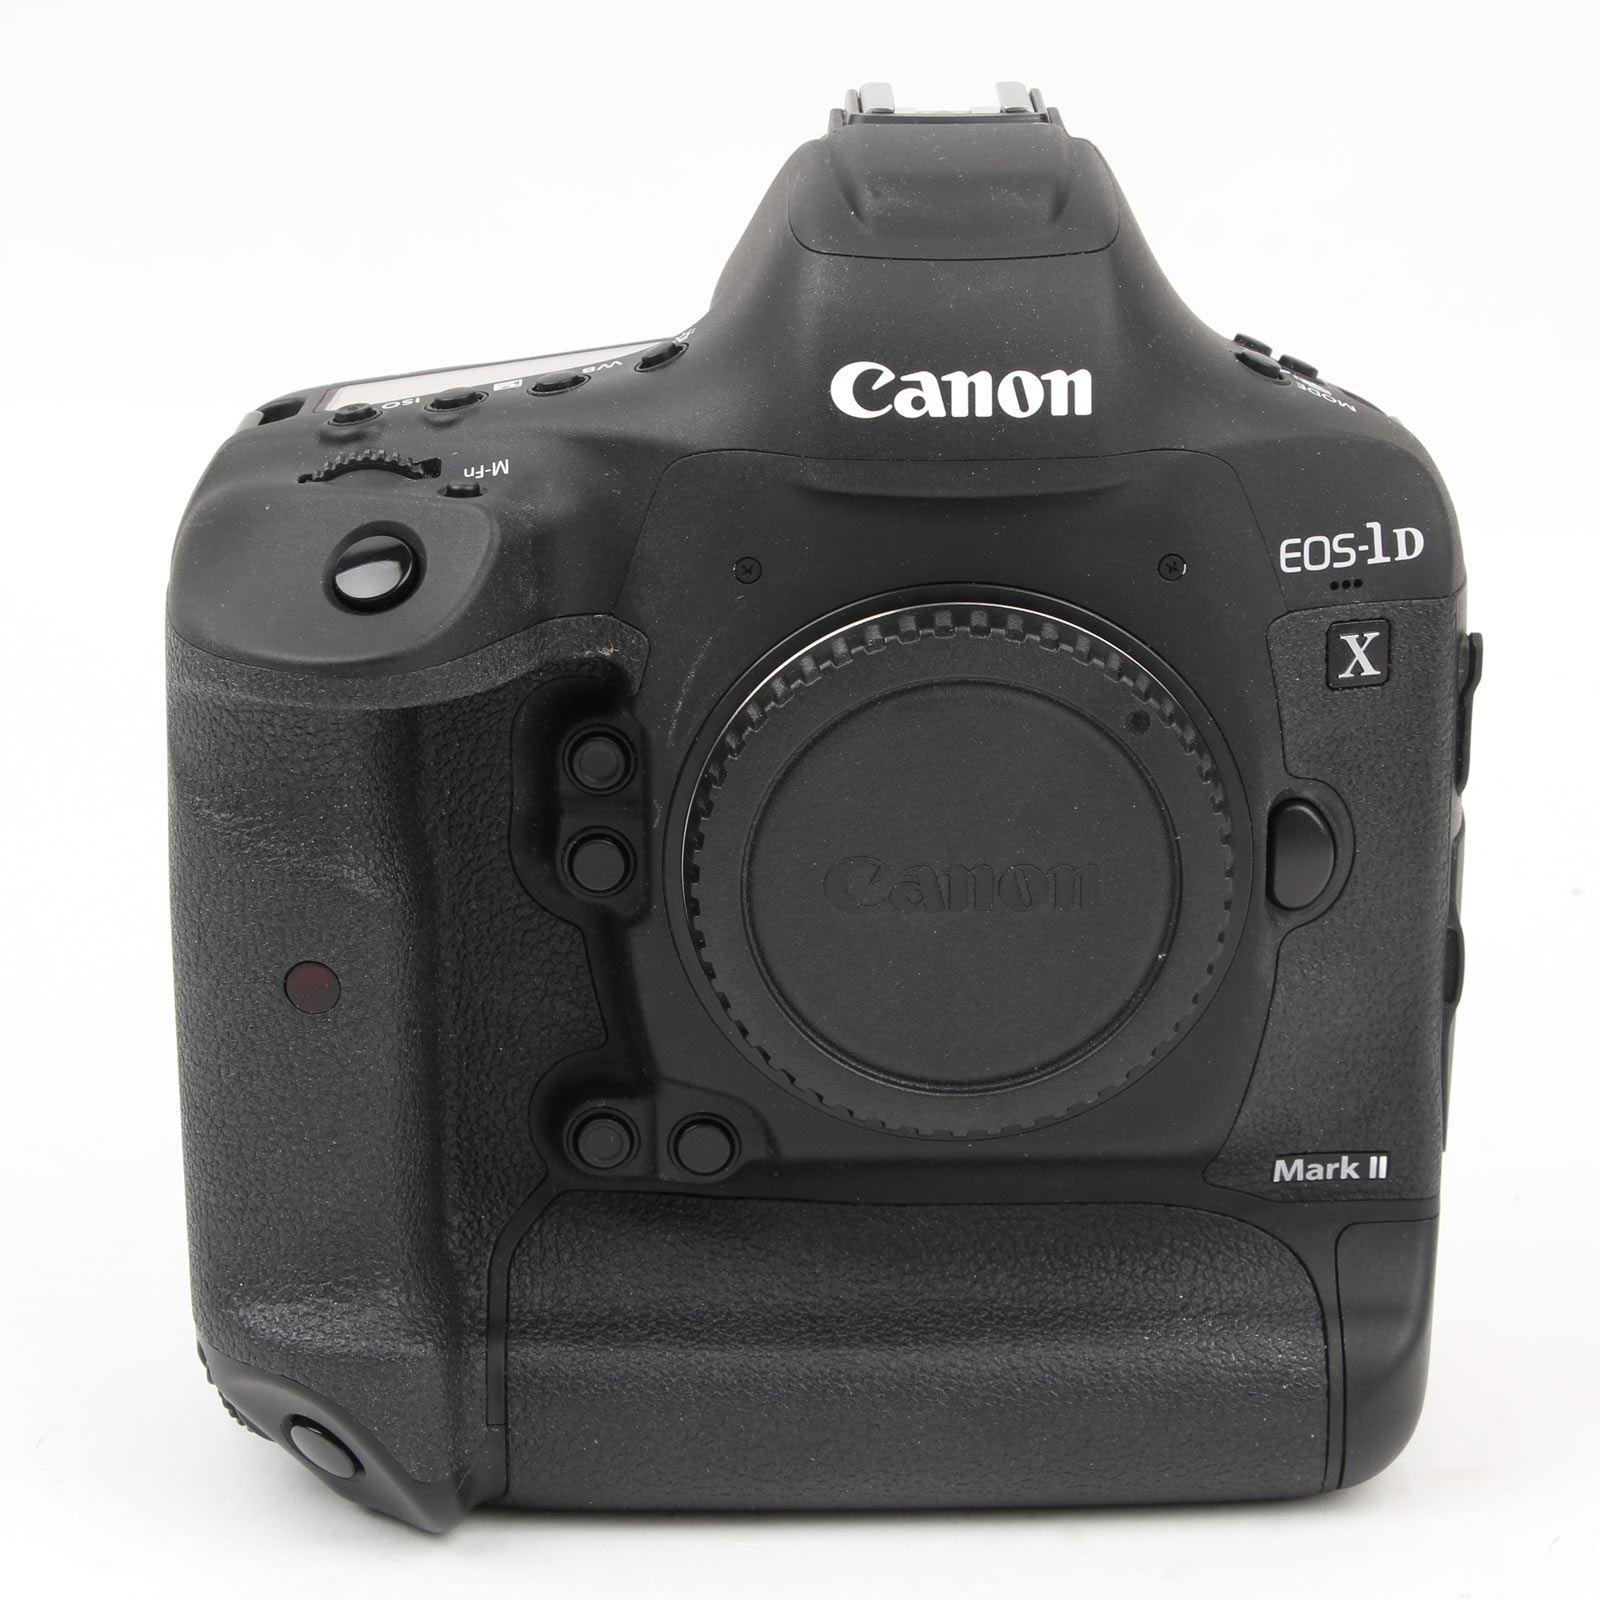 Cameras Used Canon EOS-1D X Mark II Digital SLR Camera Body